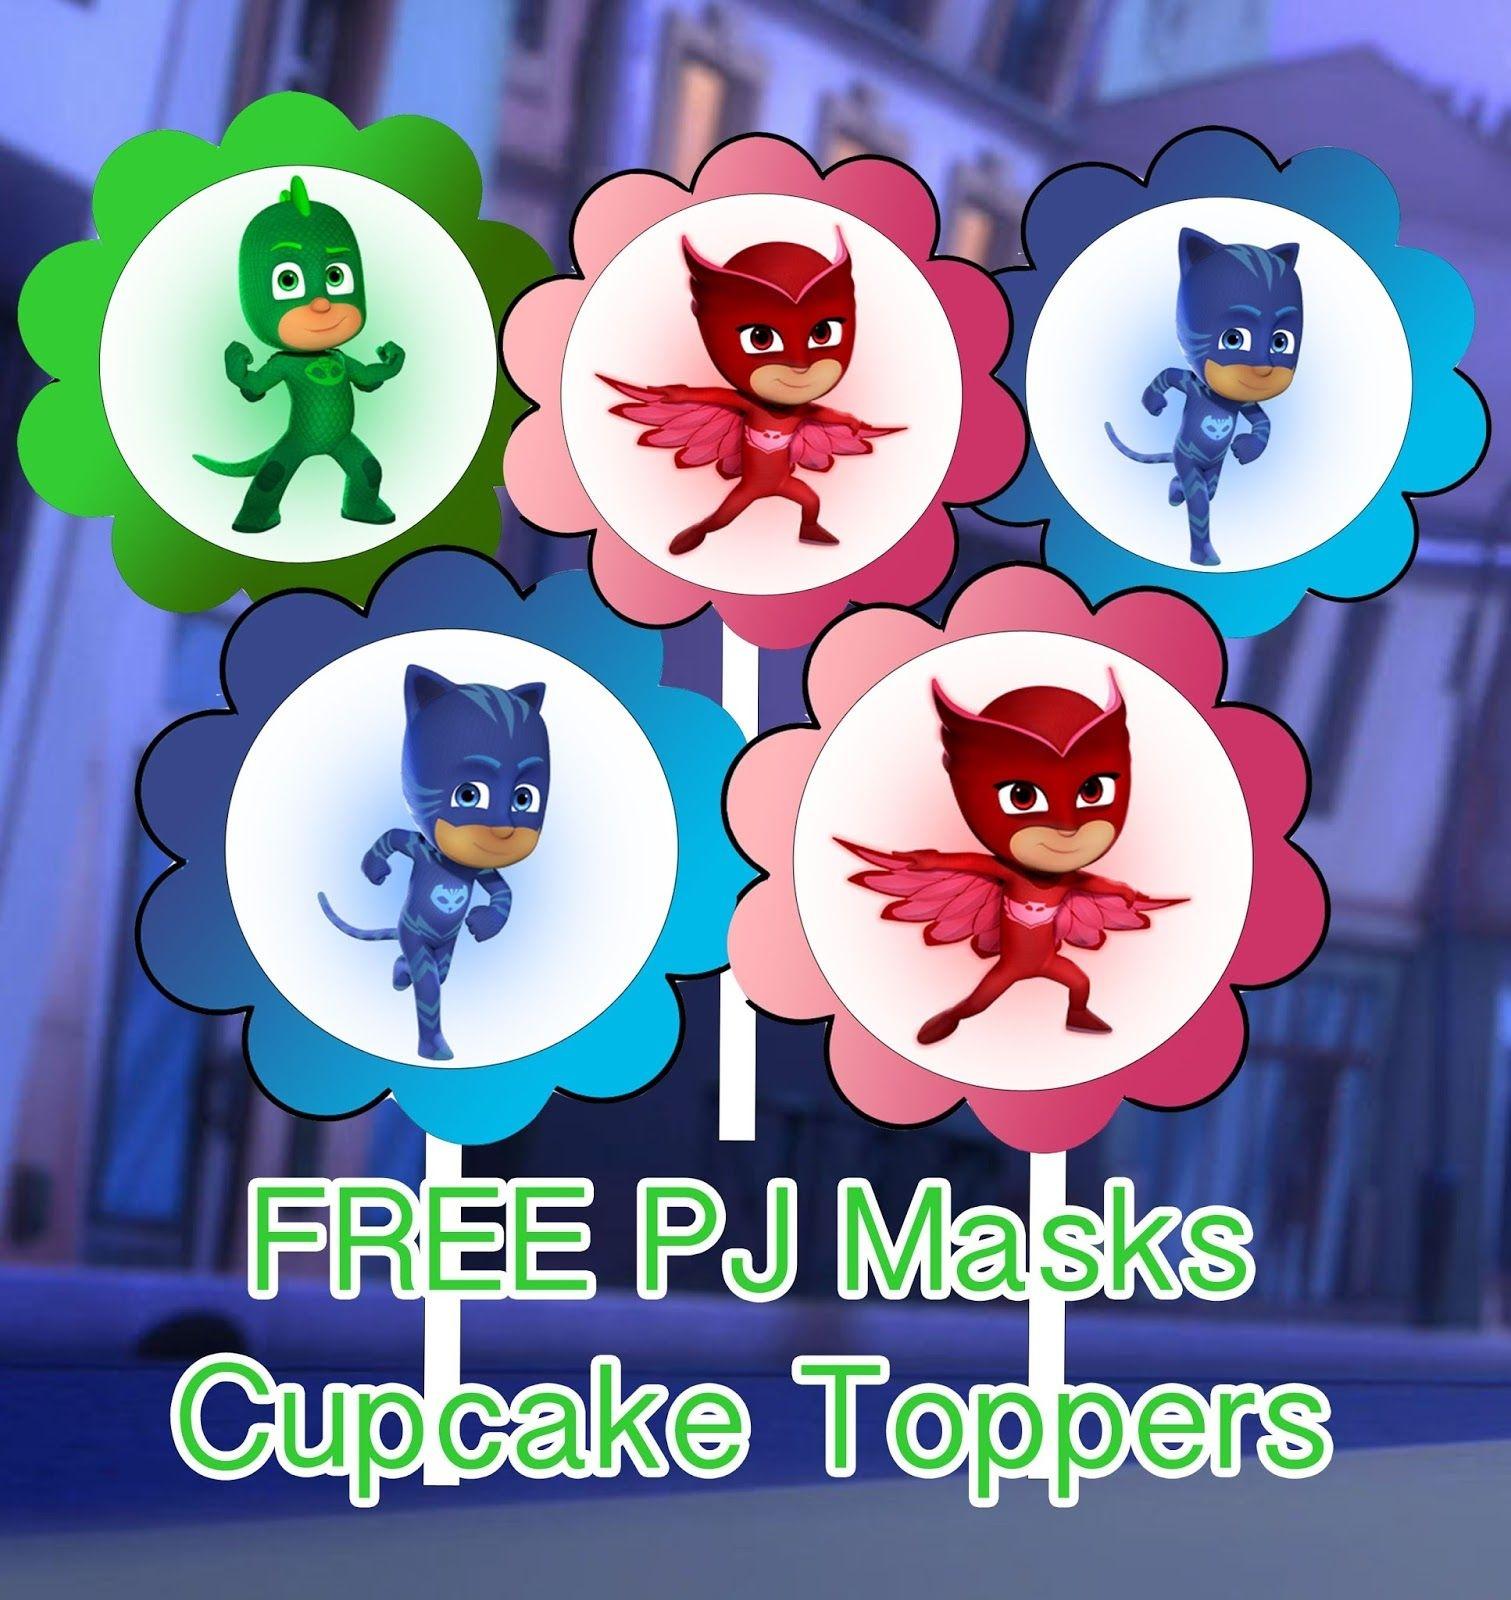 Pj Masks Birthday Party Printable Files Cupcake Toppers | Kids - Pj Mask Free Printables